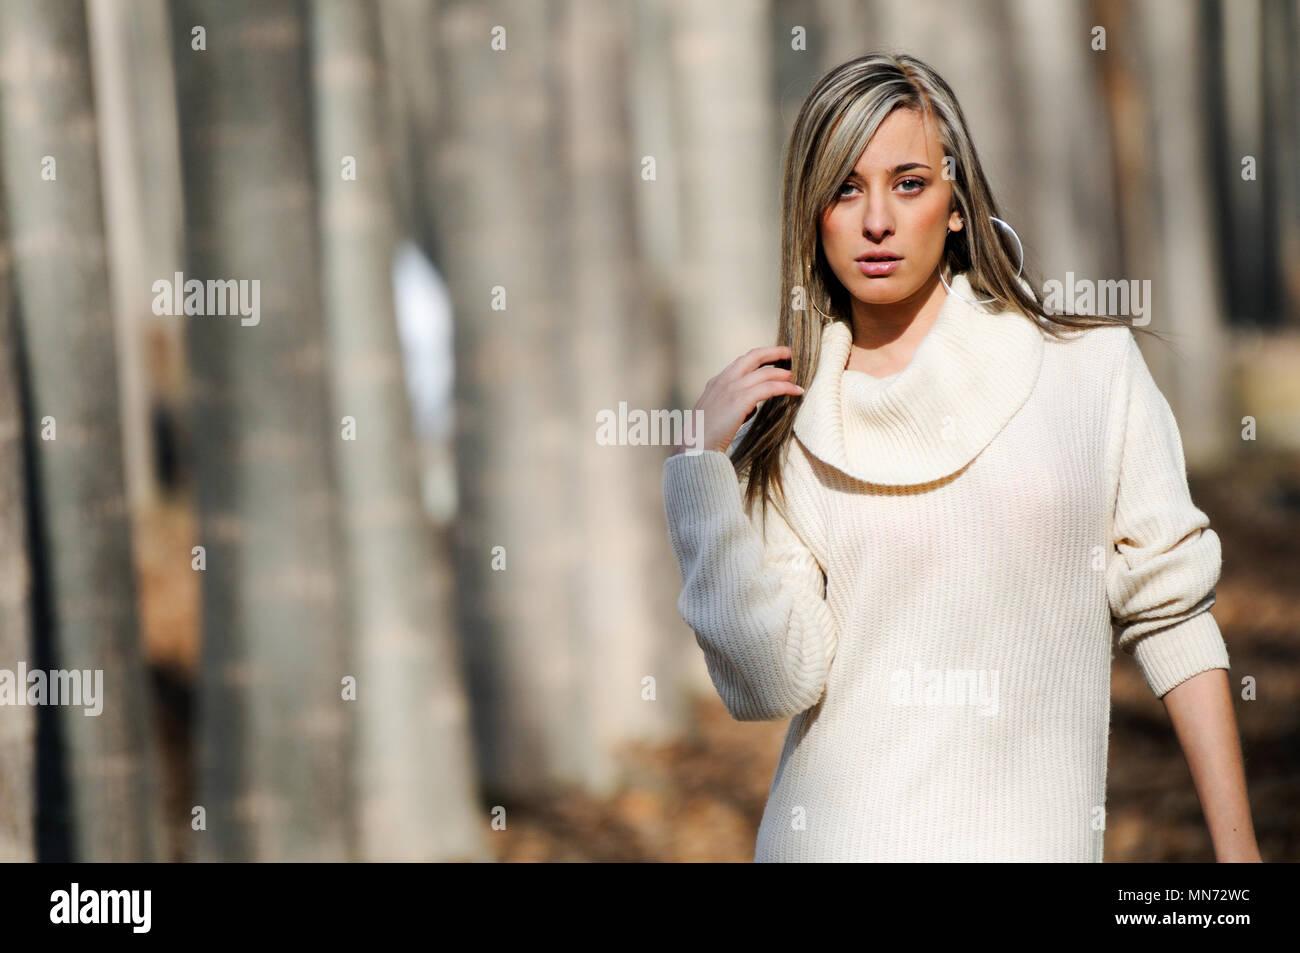 Robe beige habillee